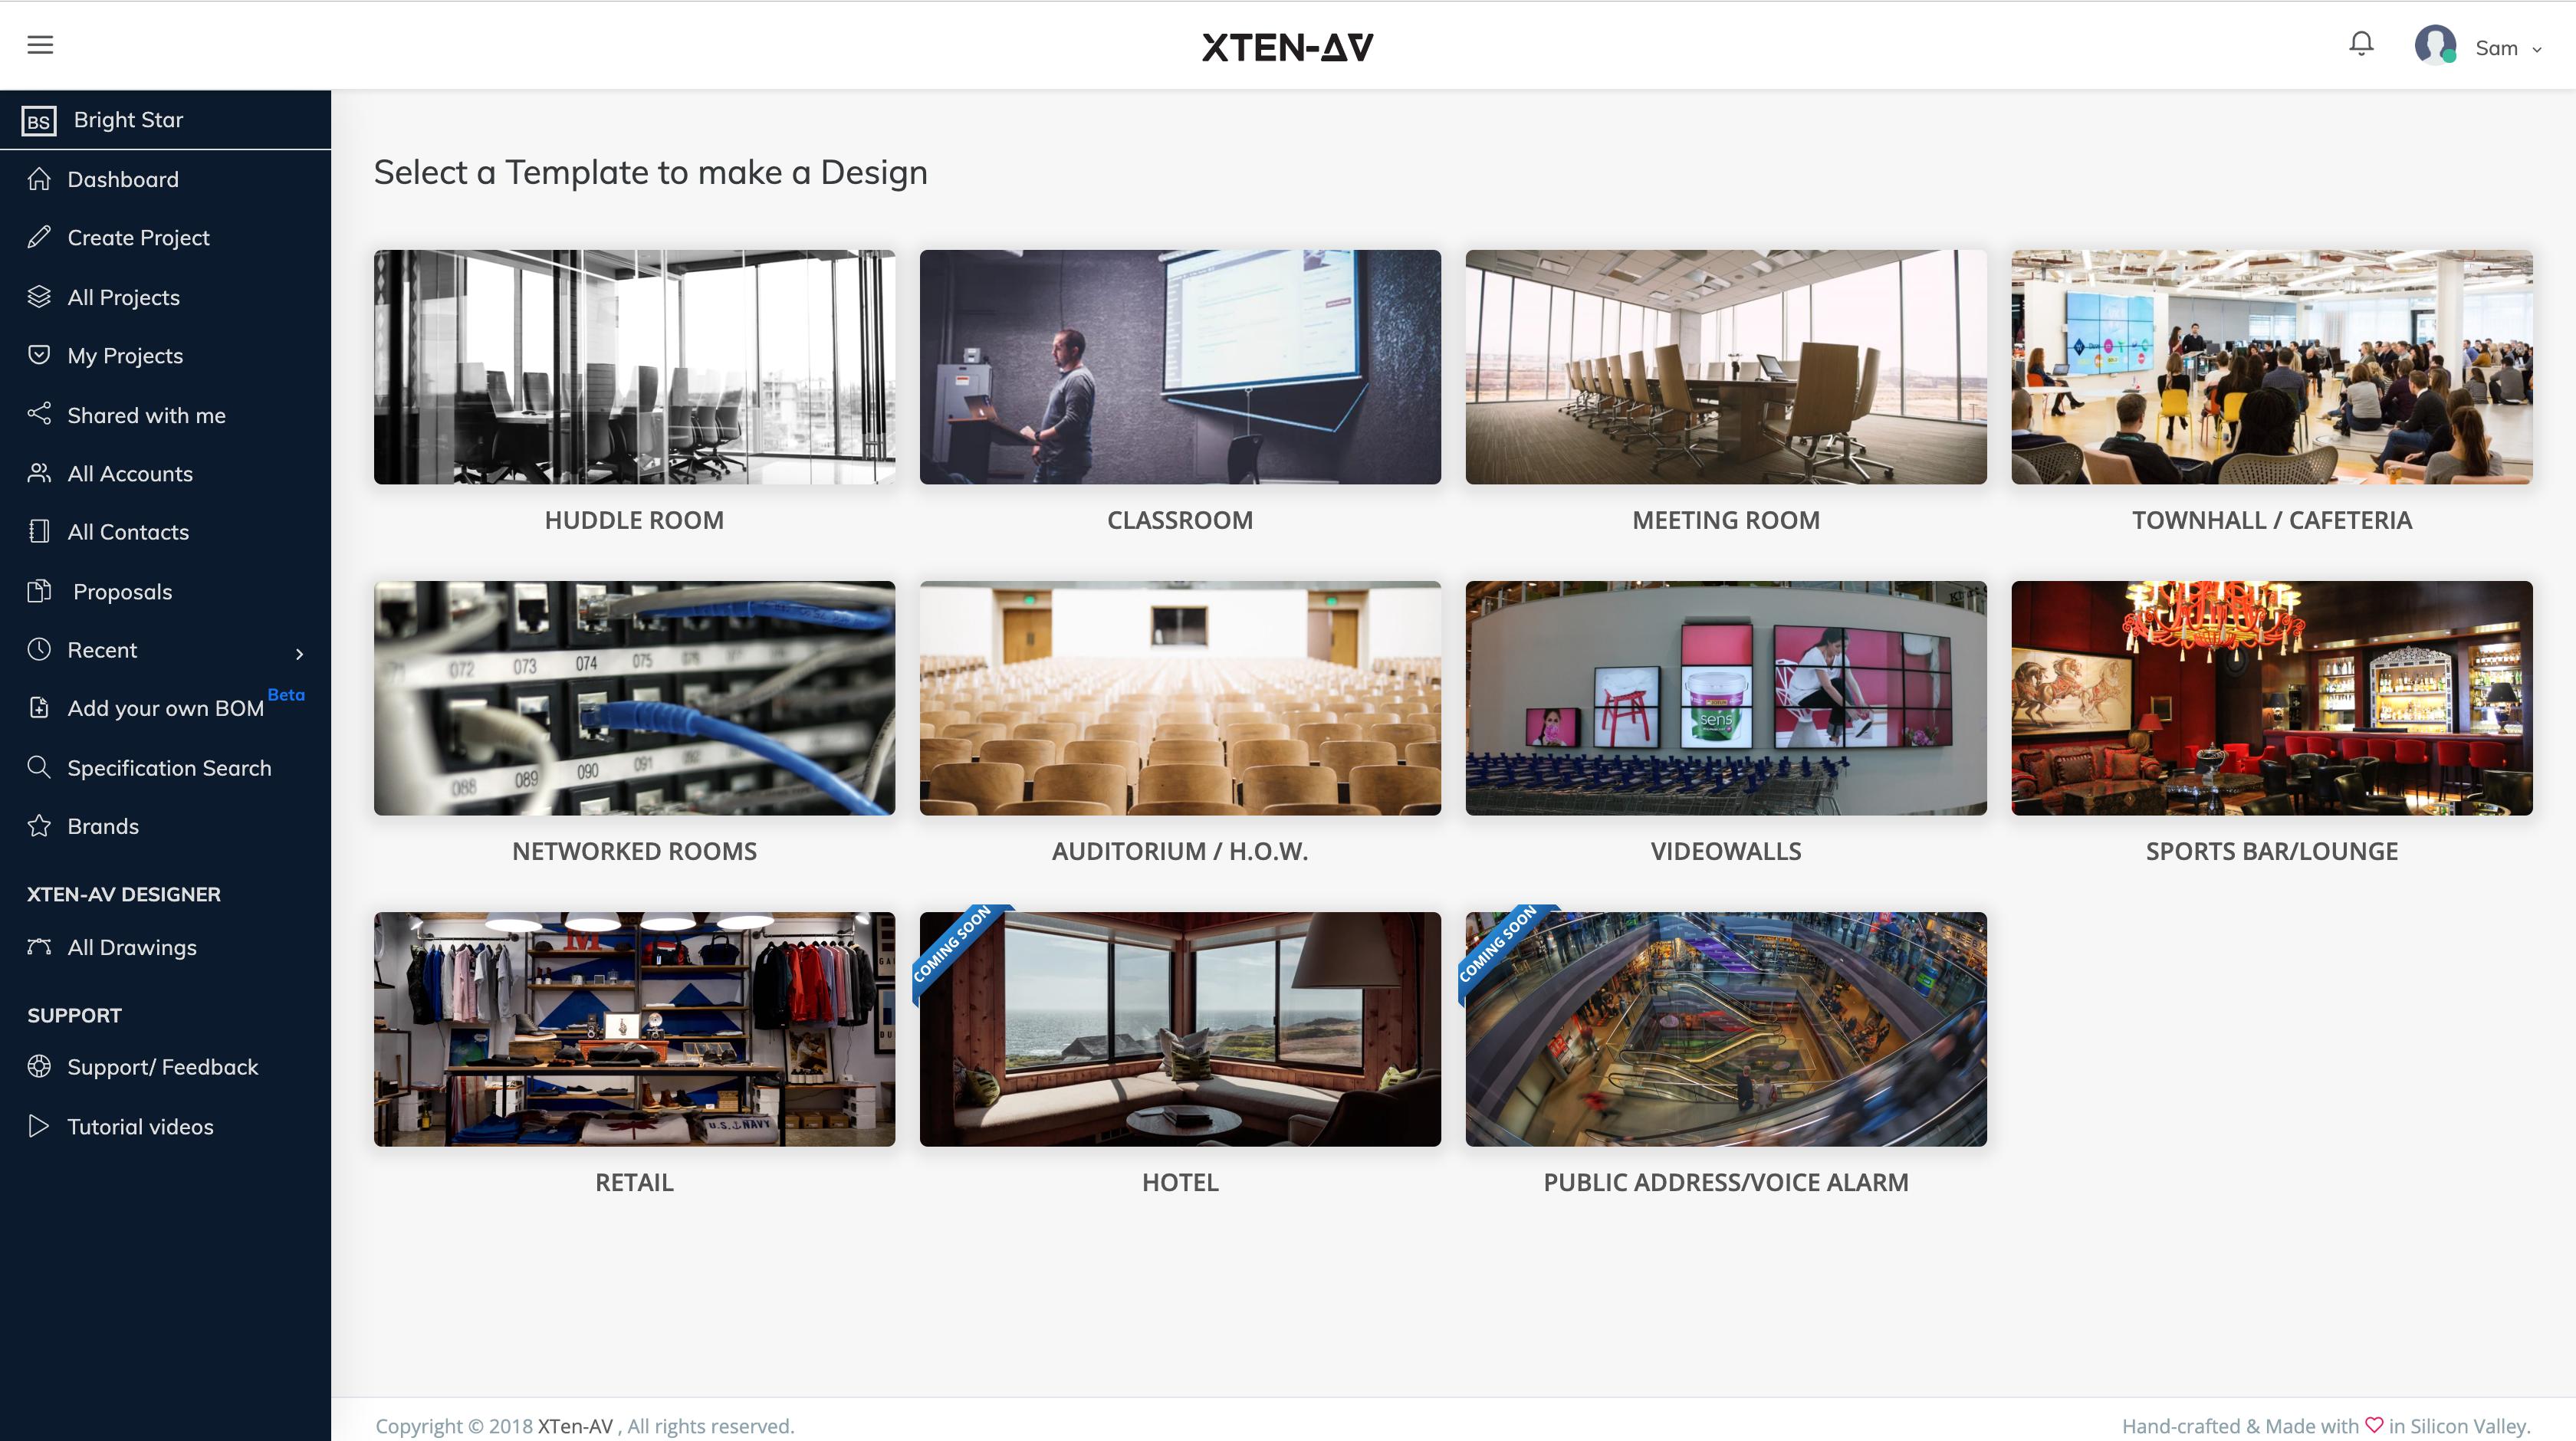 Select design template